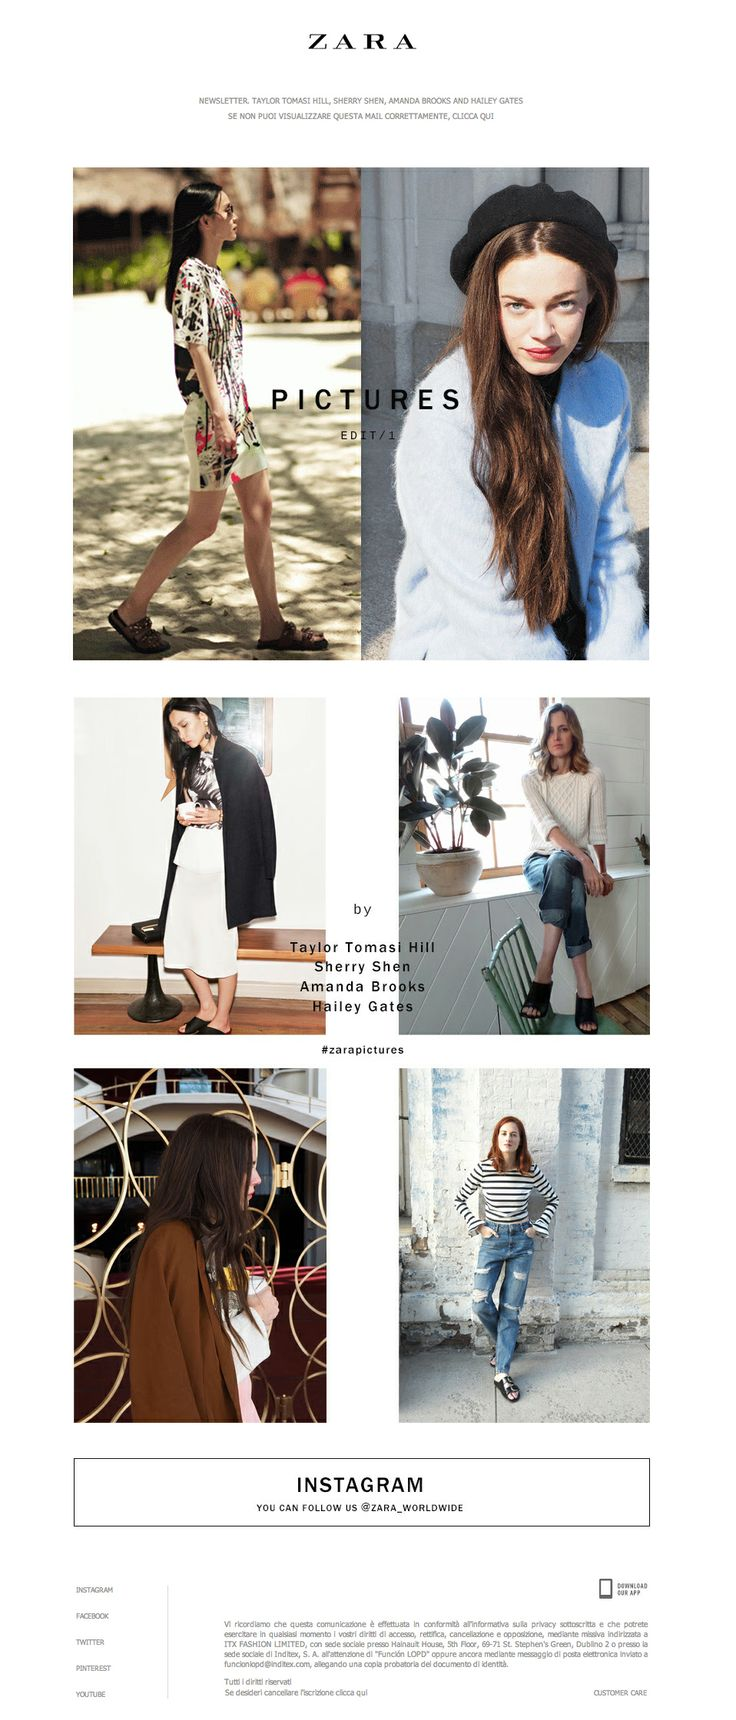 Zara poster design - Zara Poster Design Newsletter Zara 03 2014 Pictures Is Back Edit 1